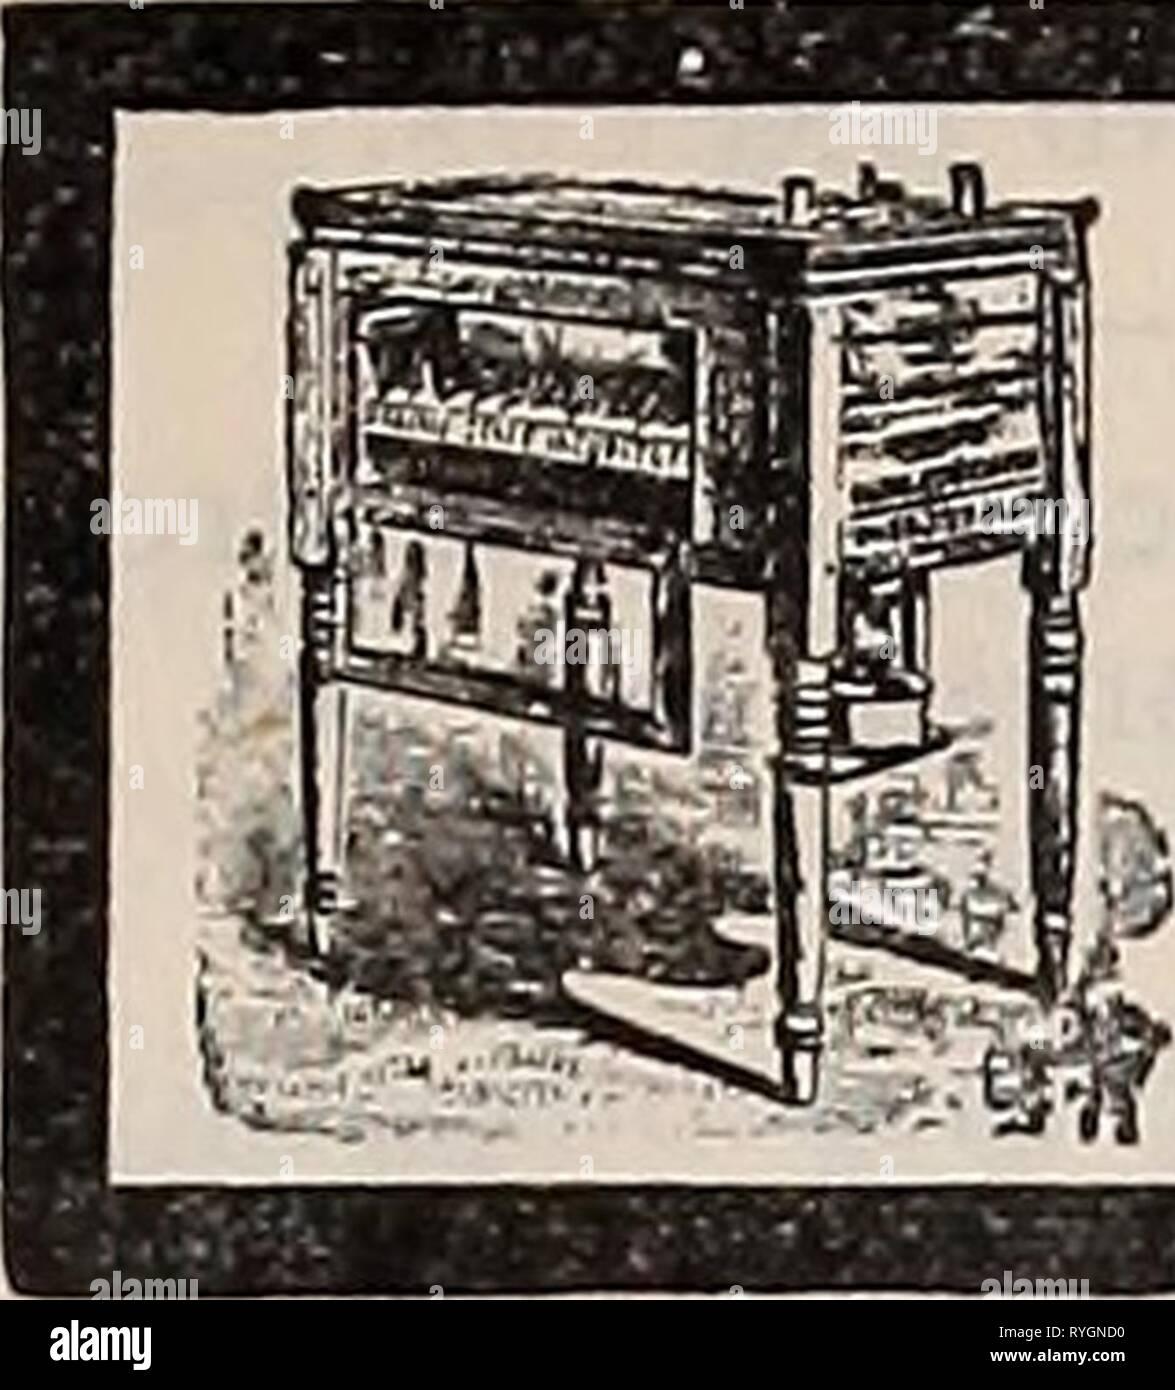 3d2b7cb3f6 El Oriental poultryman easternpoultryma61unse Año: 1904 La Oriental  POULTRYMAN. 201 de 20 incubadoras a